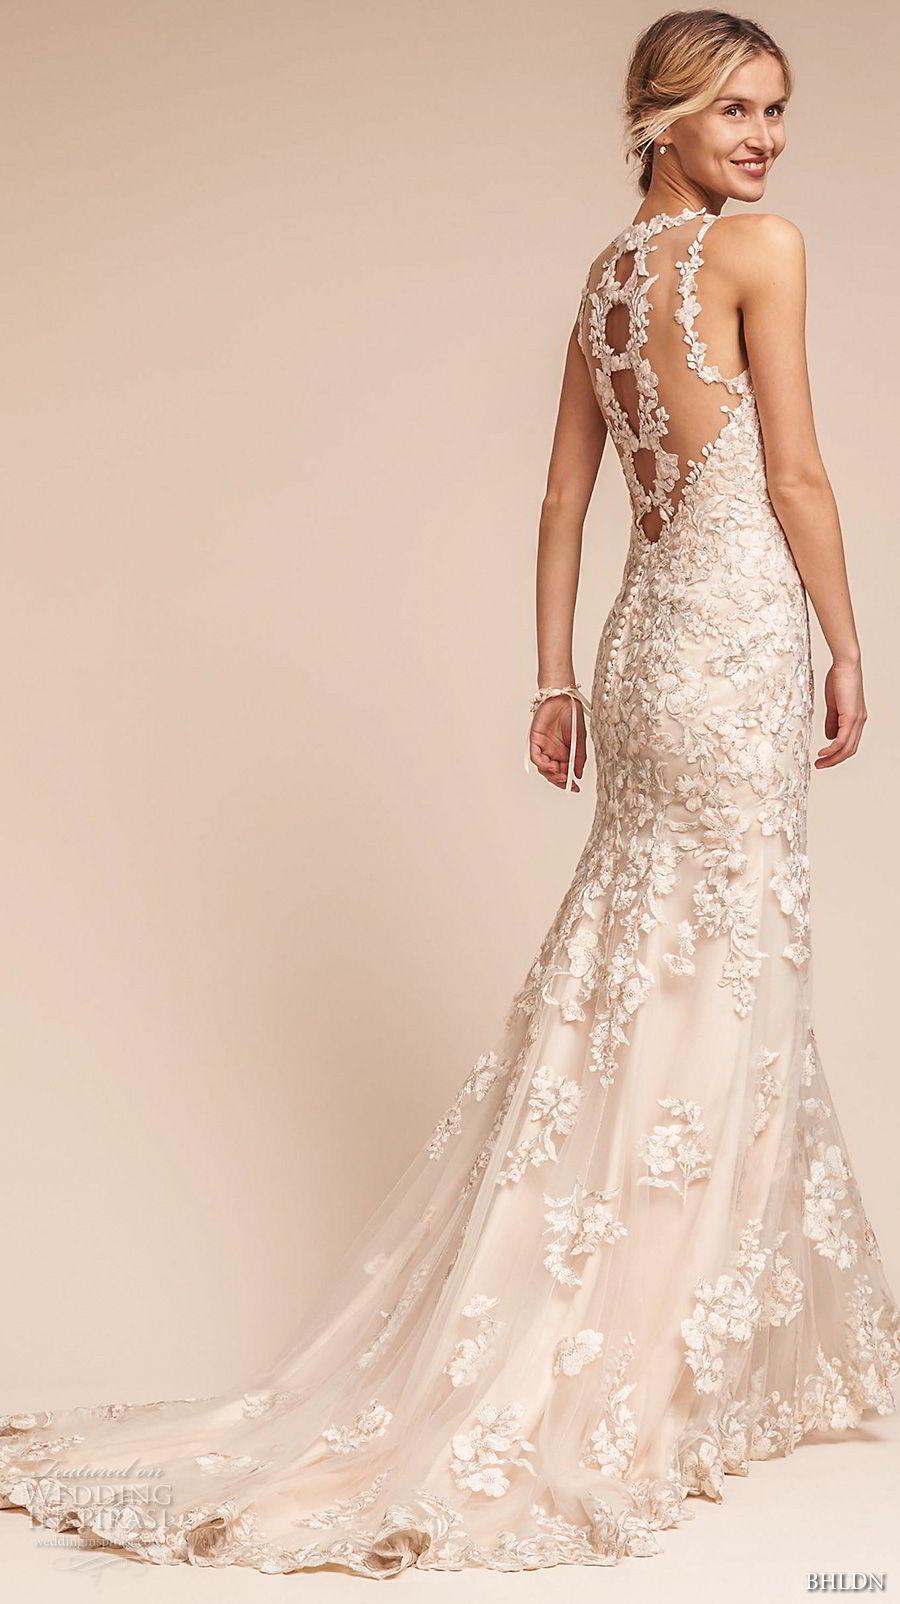 bhldn fall 2017  americana bridal sleeveless illusion jewel neck full embellishment elegant fit and flare wedding dress sheer lace back sweep train (nouveau) bv